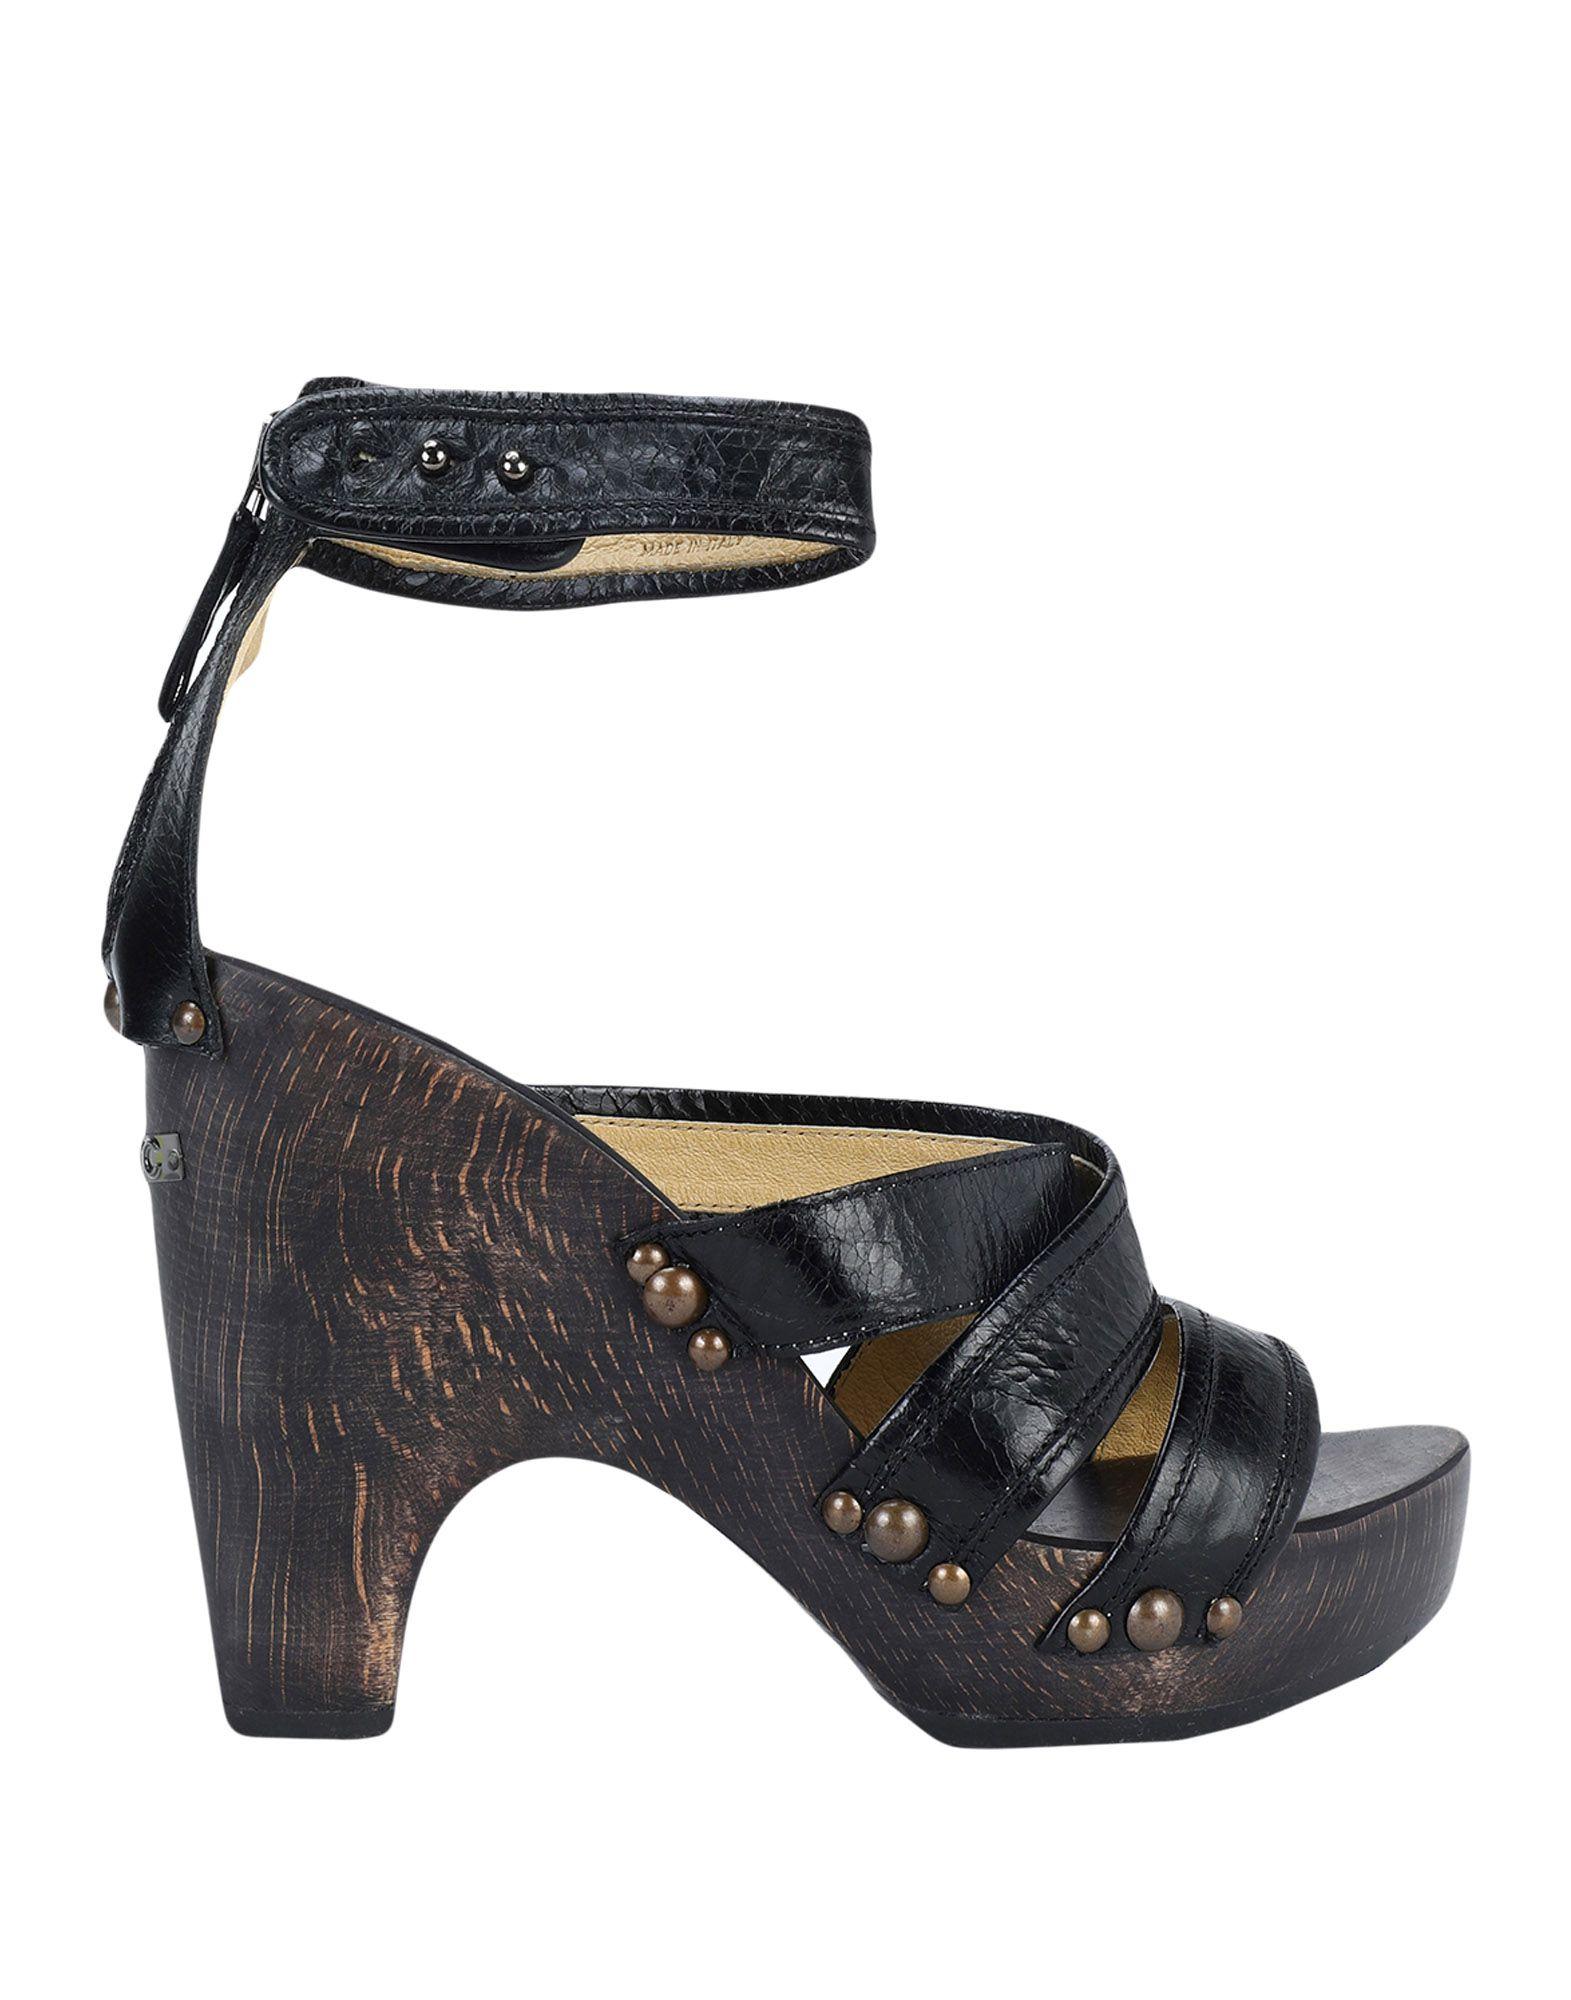 Stilvolle billige Schuhe C'n'c' Costume 11561547JT National Sandalen Damen  11561547JT Costume c16fb6